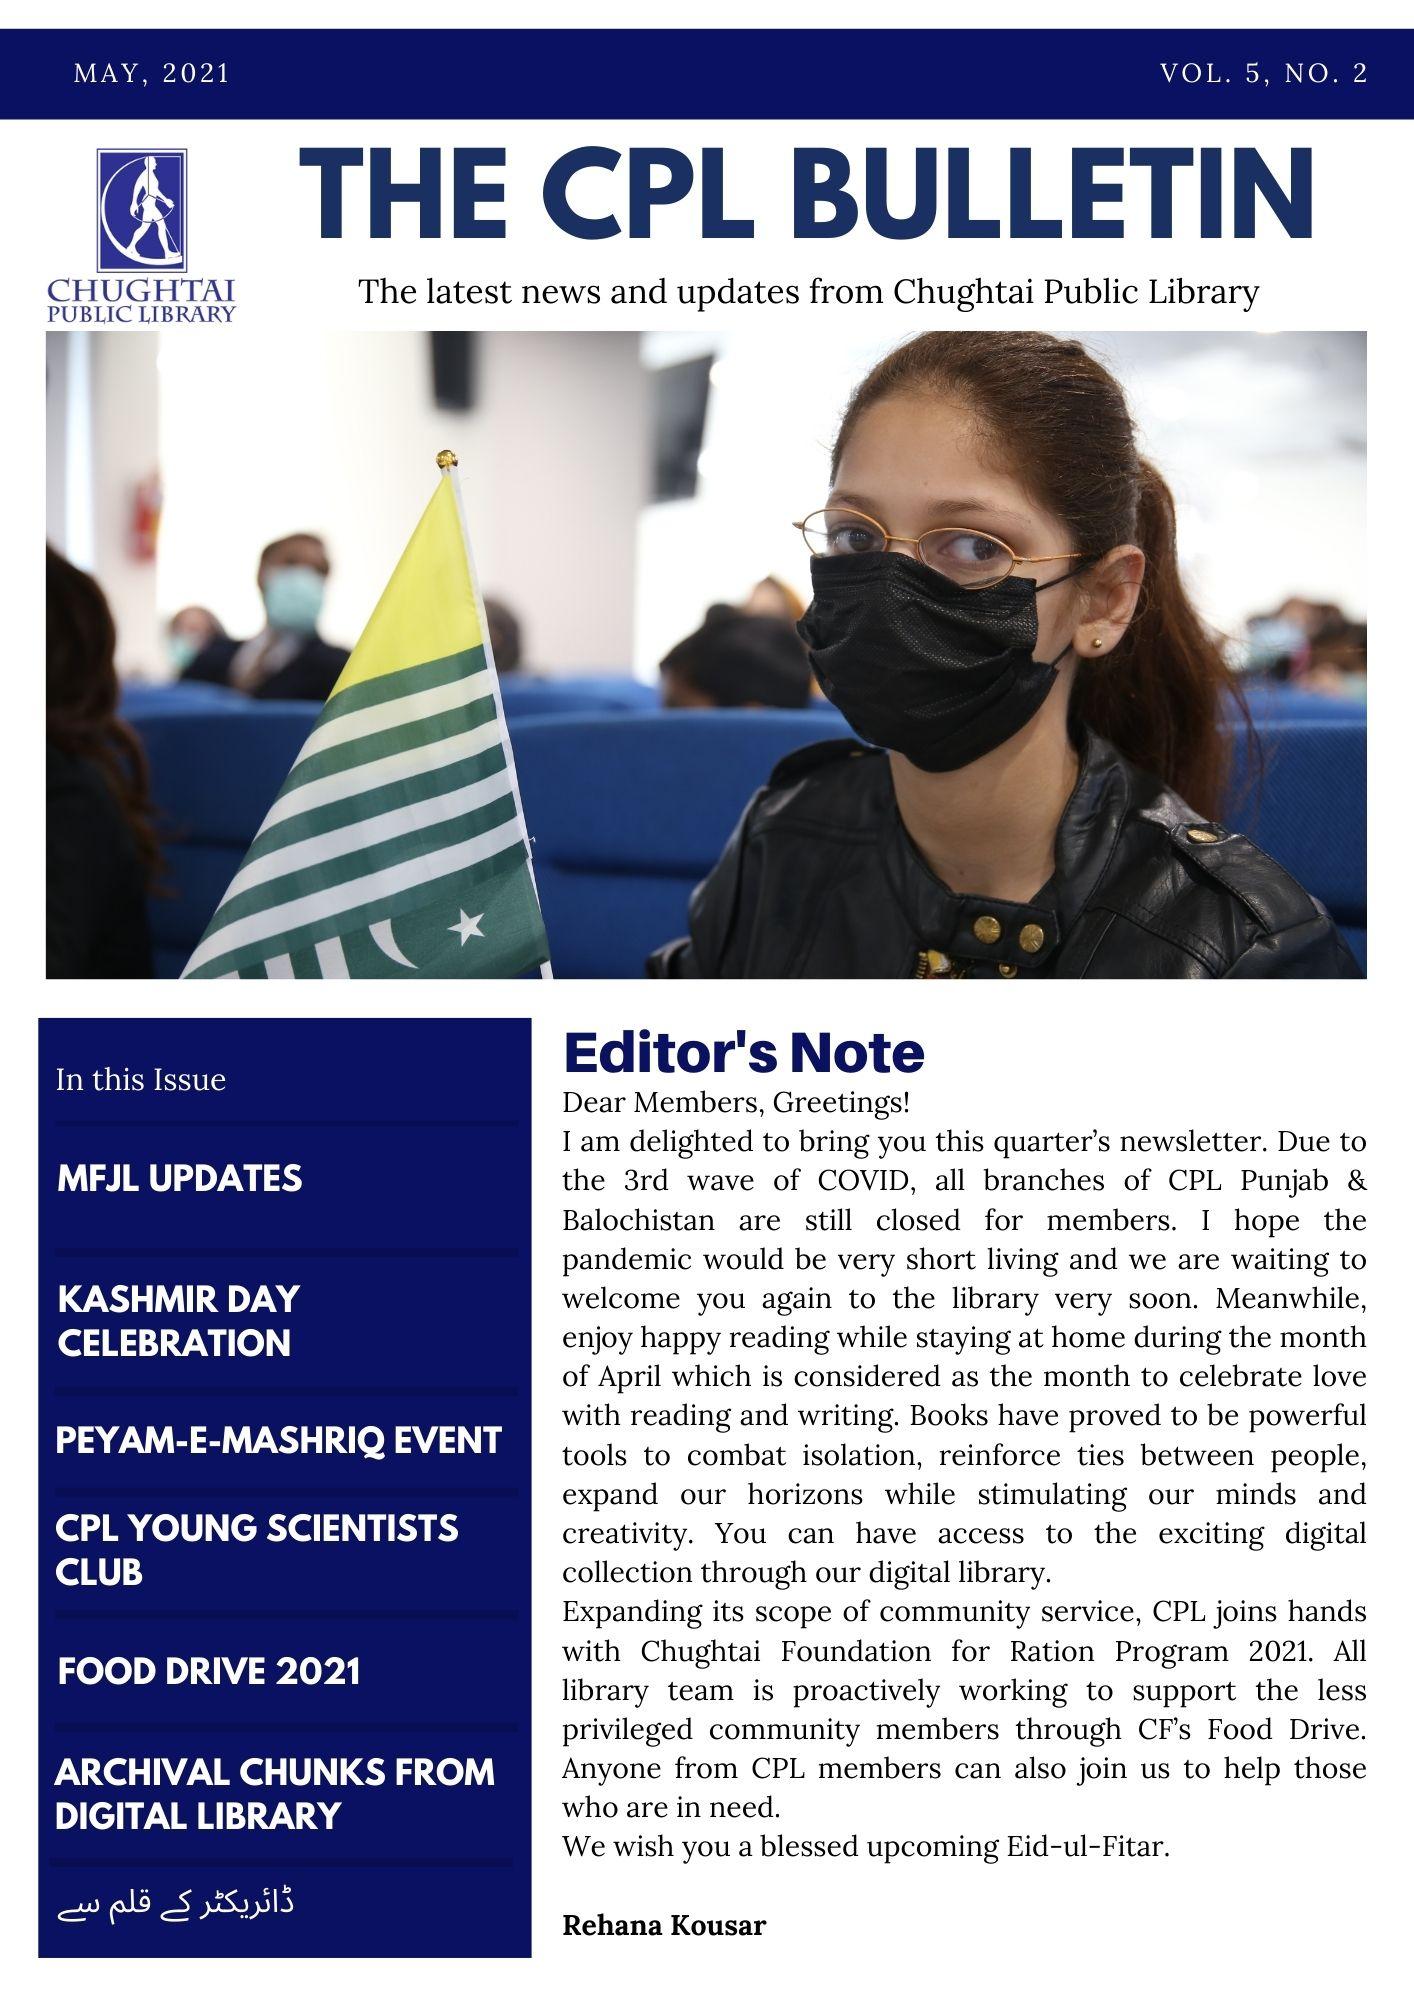 The CPL Bulletin